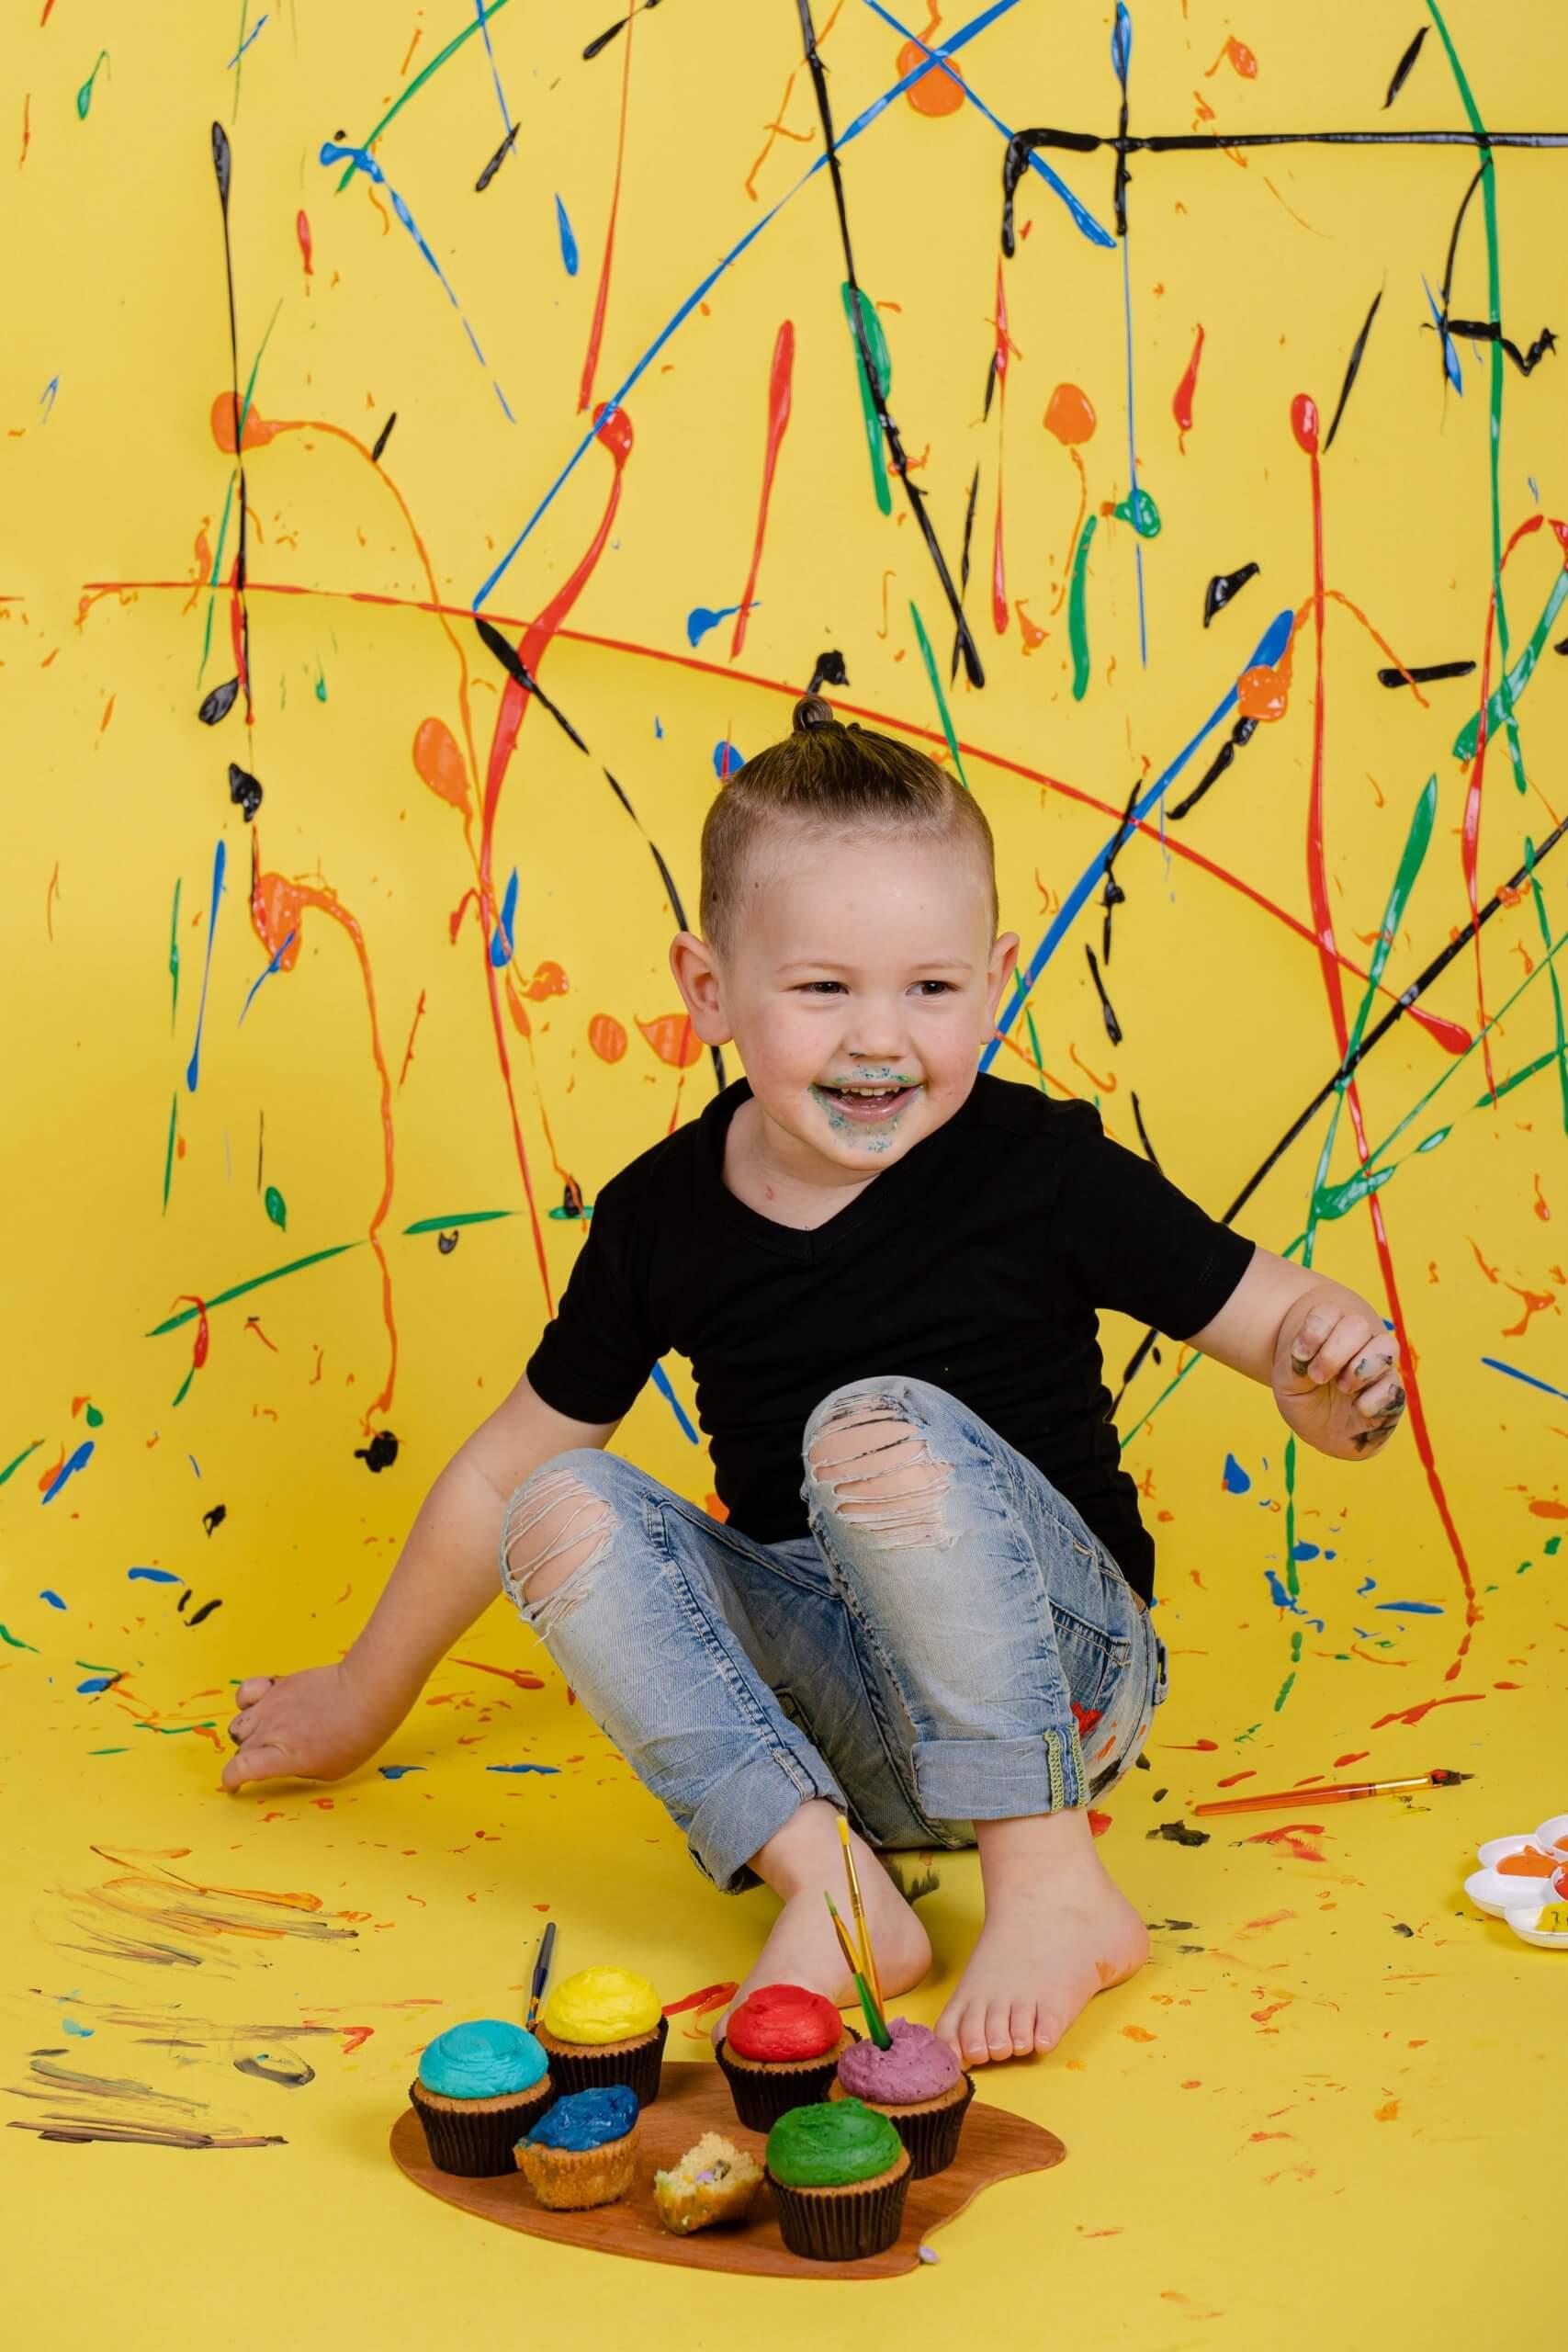 Cake Smash 4 jaar oud feest party cake paint verf painting Driebergen